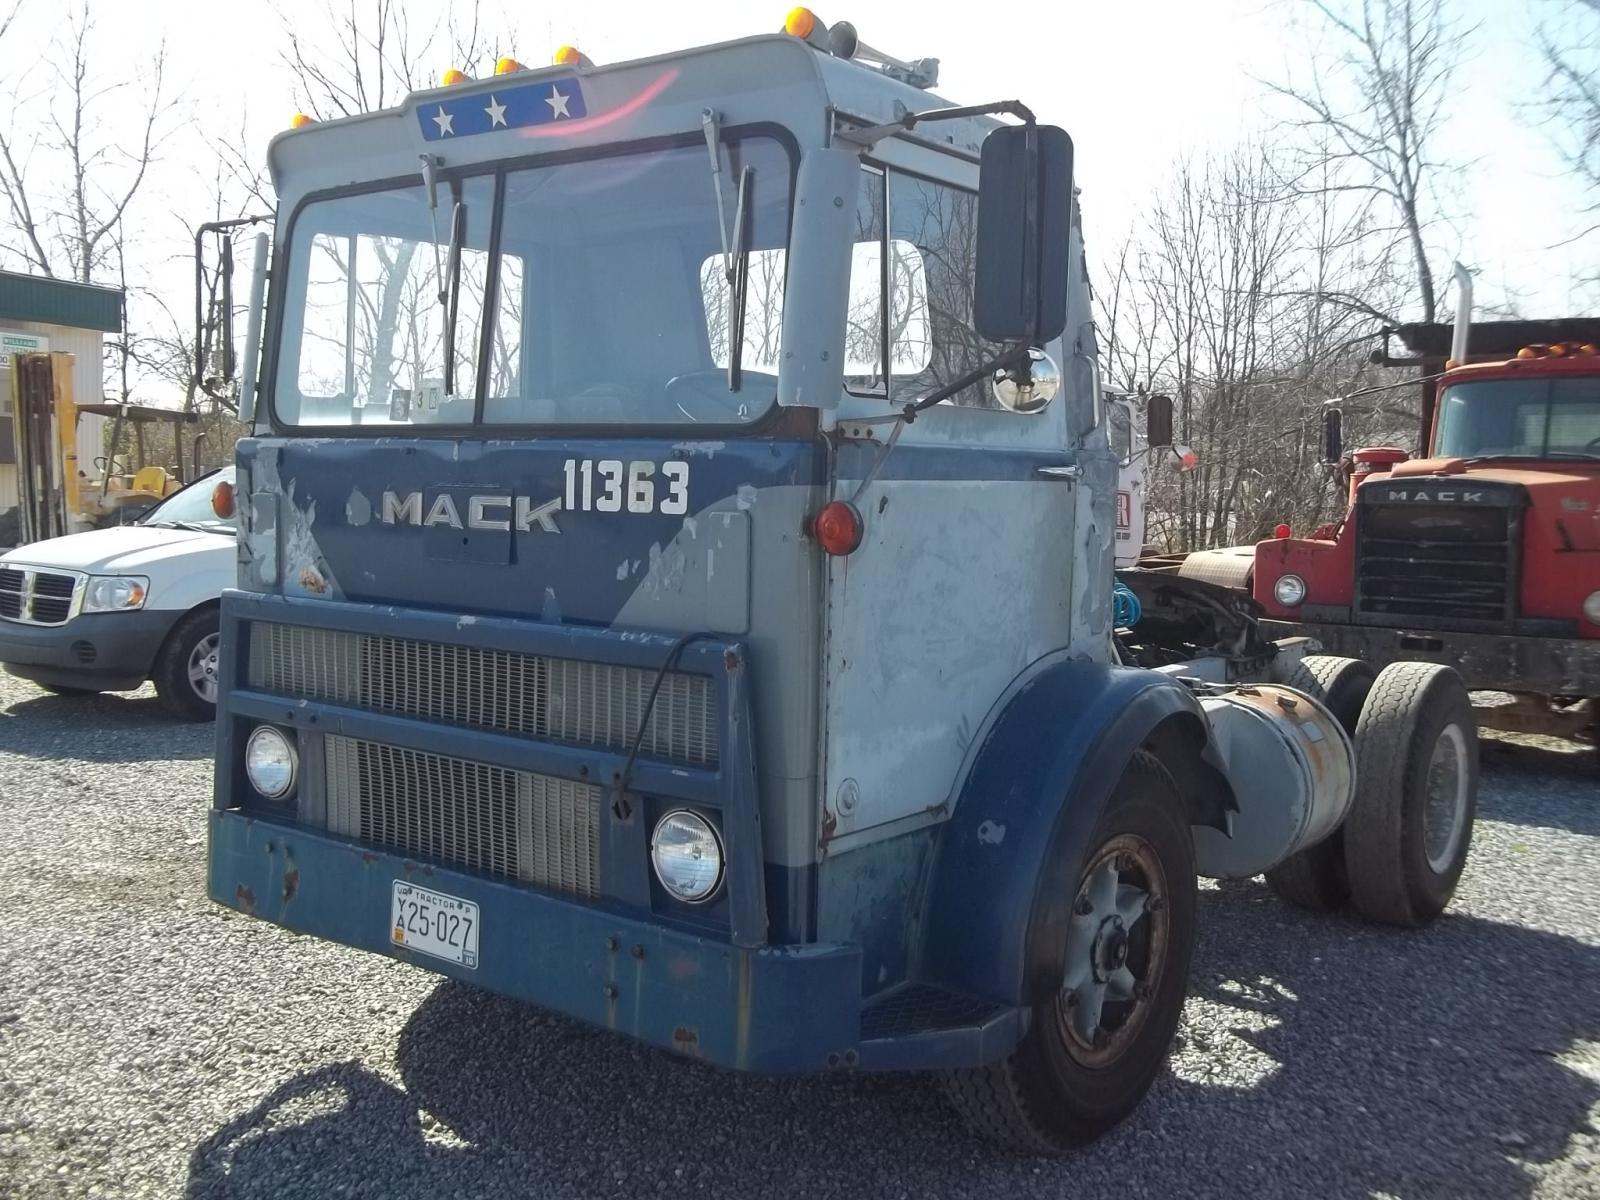 1969 mack mb - Trucks for Sale - BigMackTrucks.com